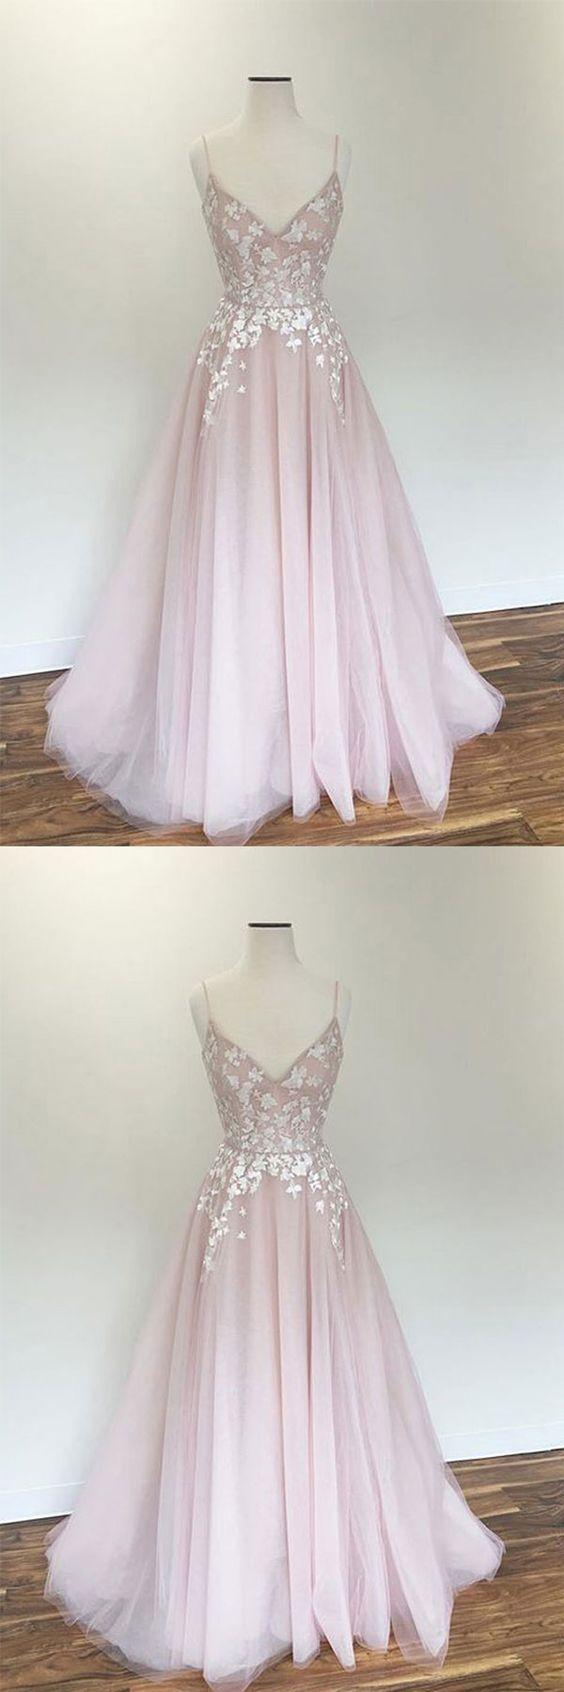 Hochzeit - Light Pink V Neck Tulle Applique Long Prom Dress, Pink Evening Dress